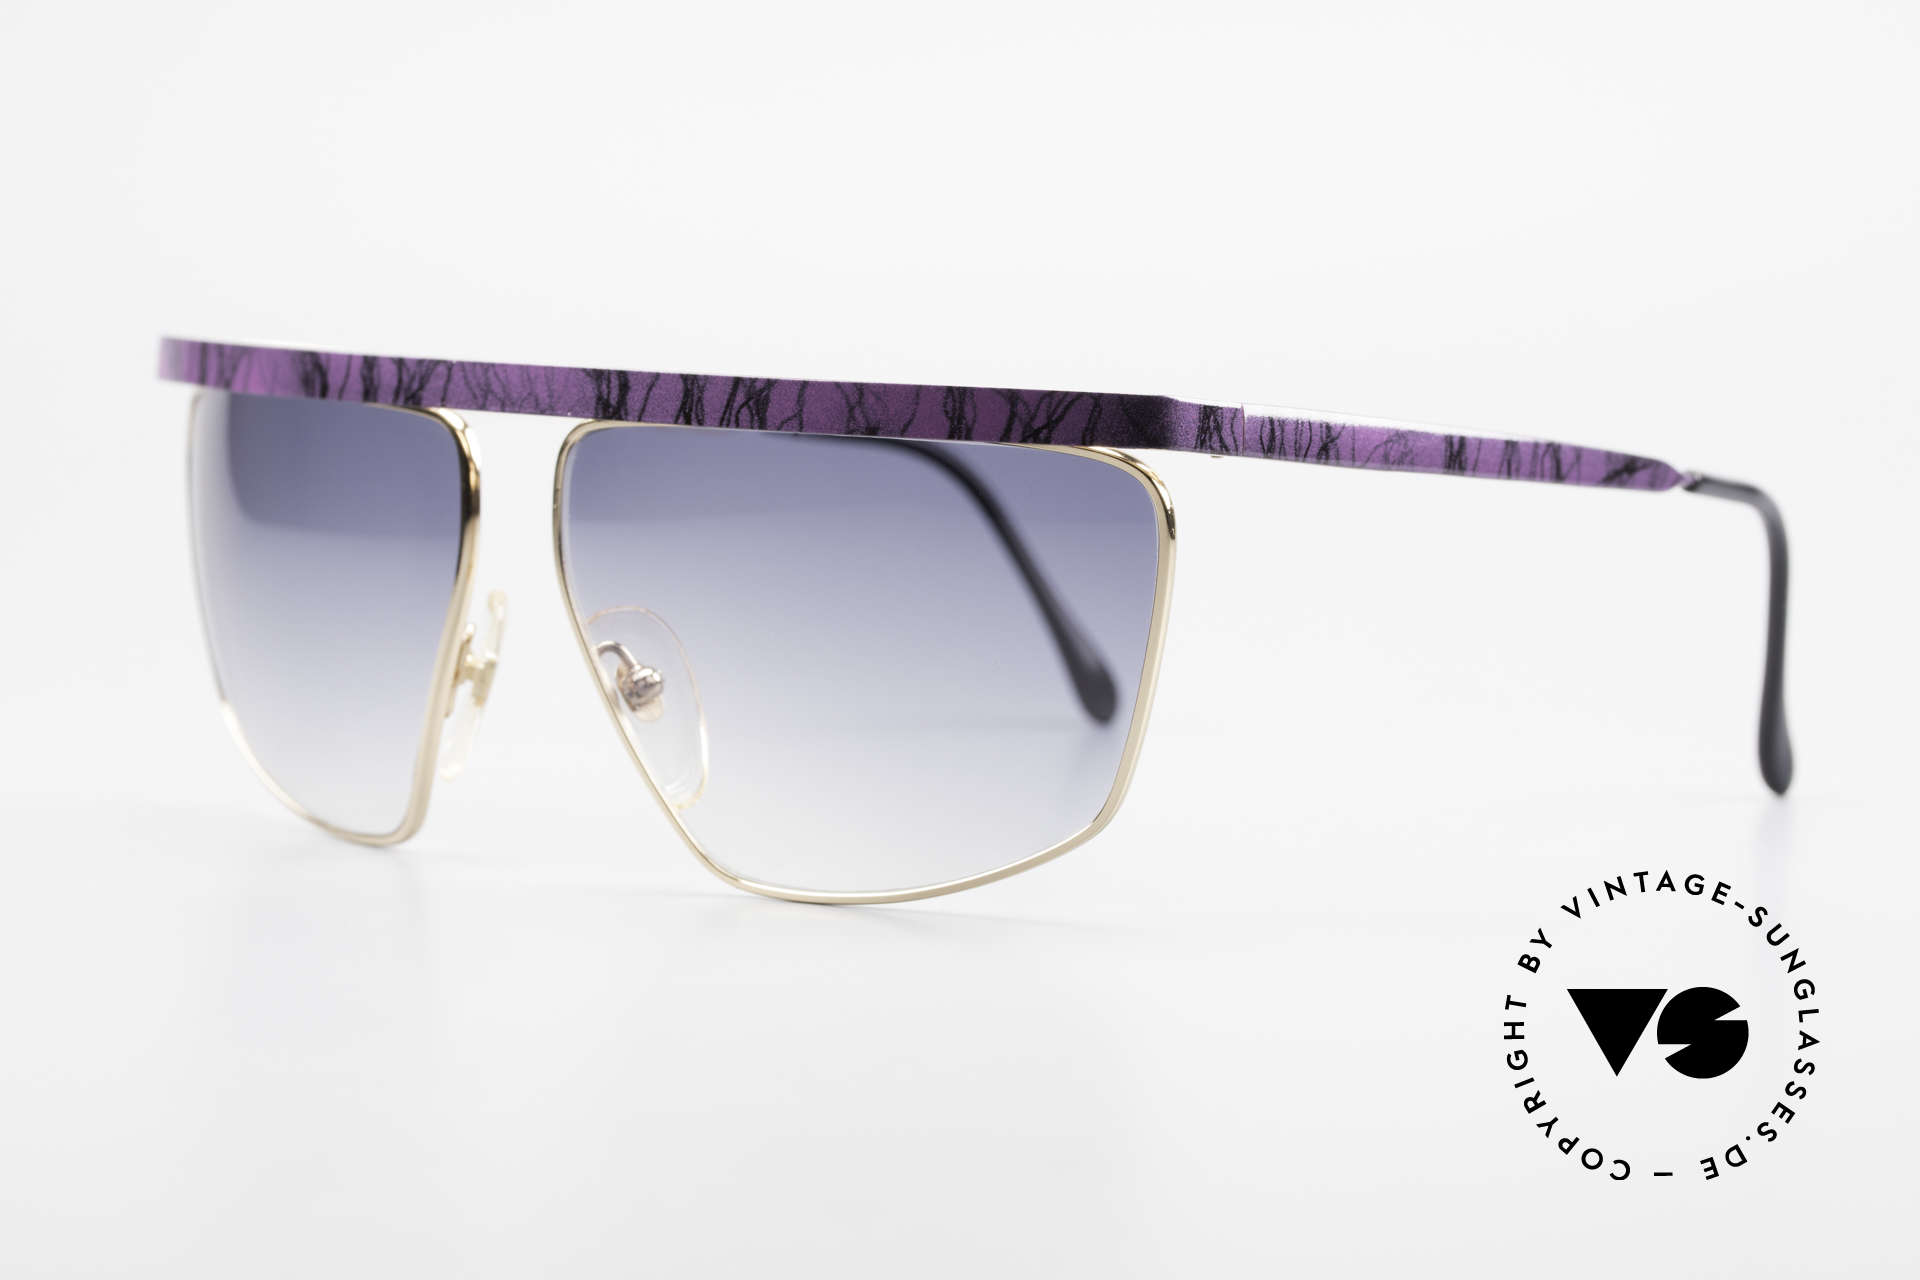 Casanova CN7 Gold-Plated Luxury Sunglasses, blue-gradient sun lenses (for 100% UV protection), Made for Men and Women